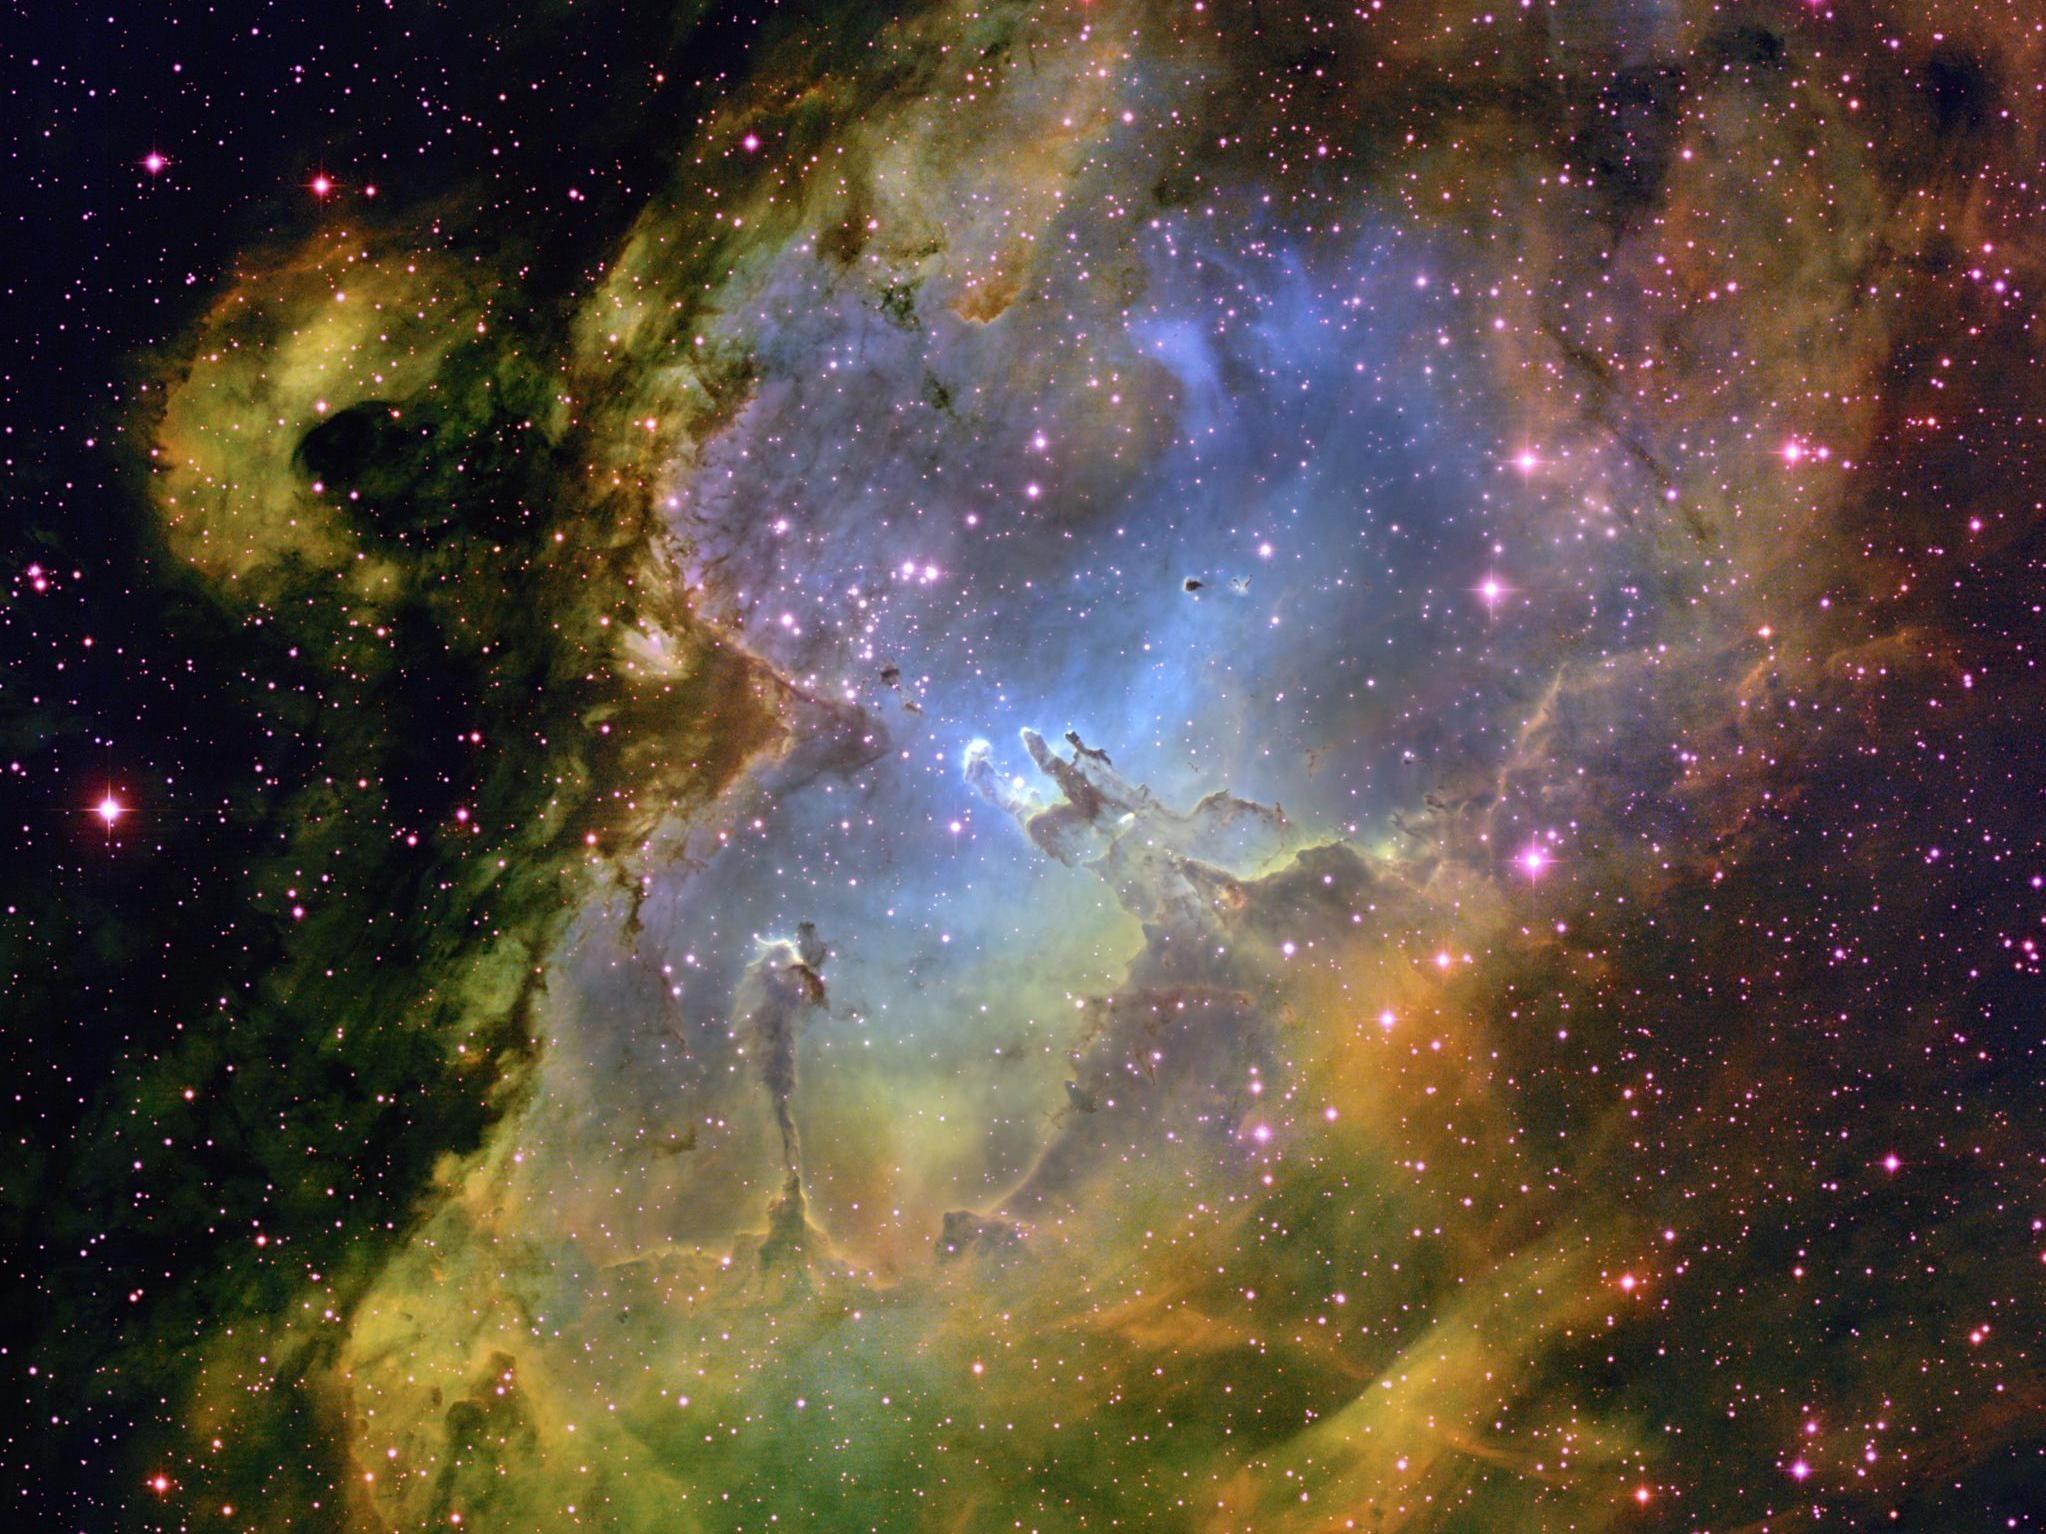 Eagle Nebula HD Desktop Wallpaper Amazing Wallpaperz 1920x1200 Backgrounds 36 Wallpapers